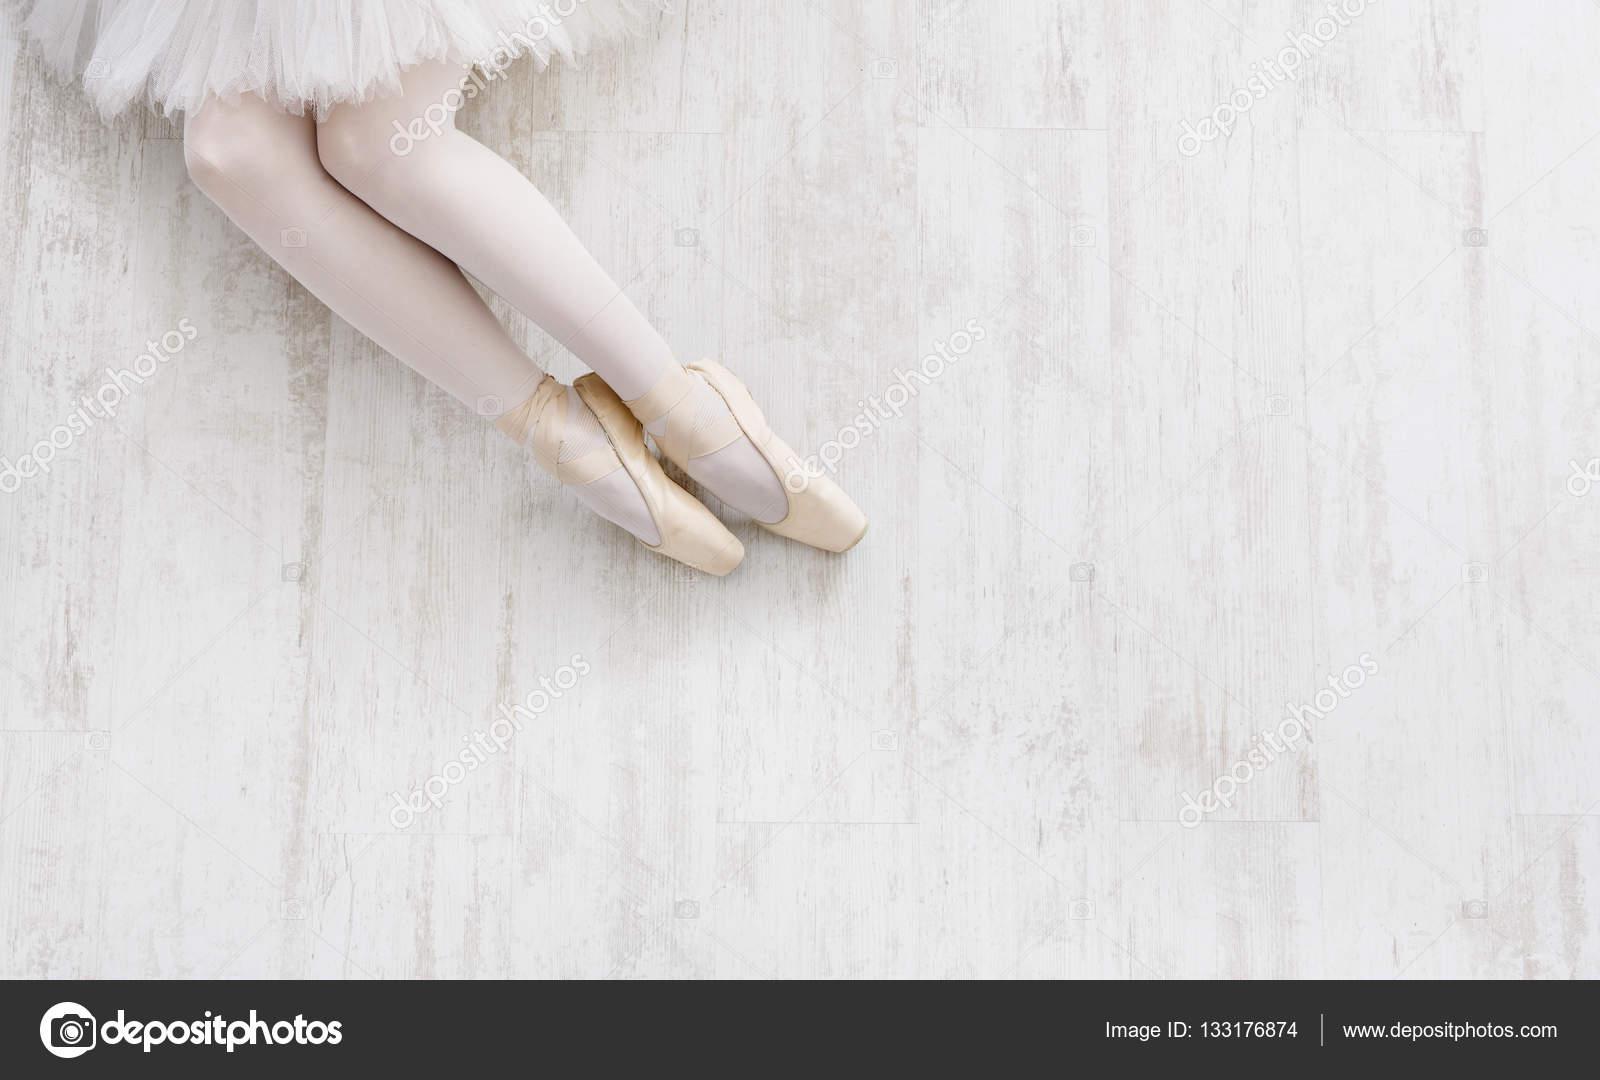 Балет картинки красивые. Балерина в пуанты 11640905466a4